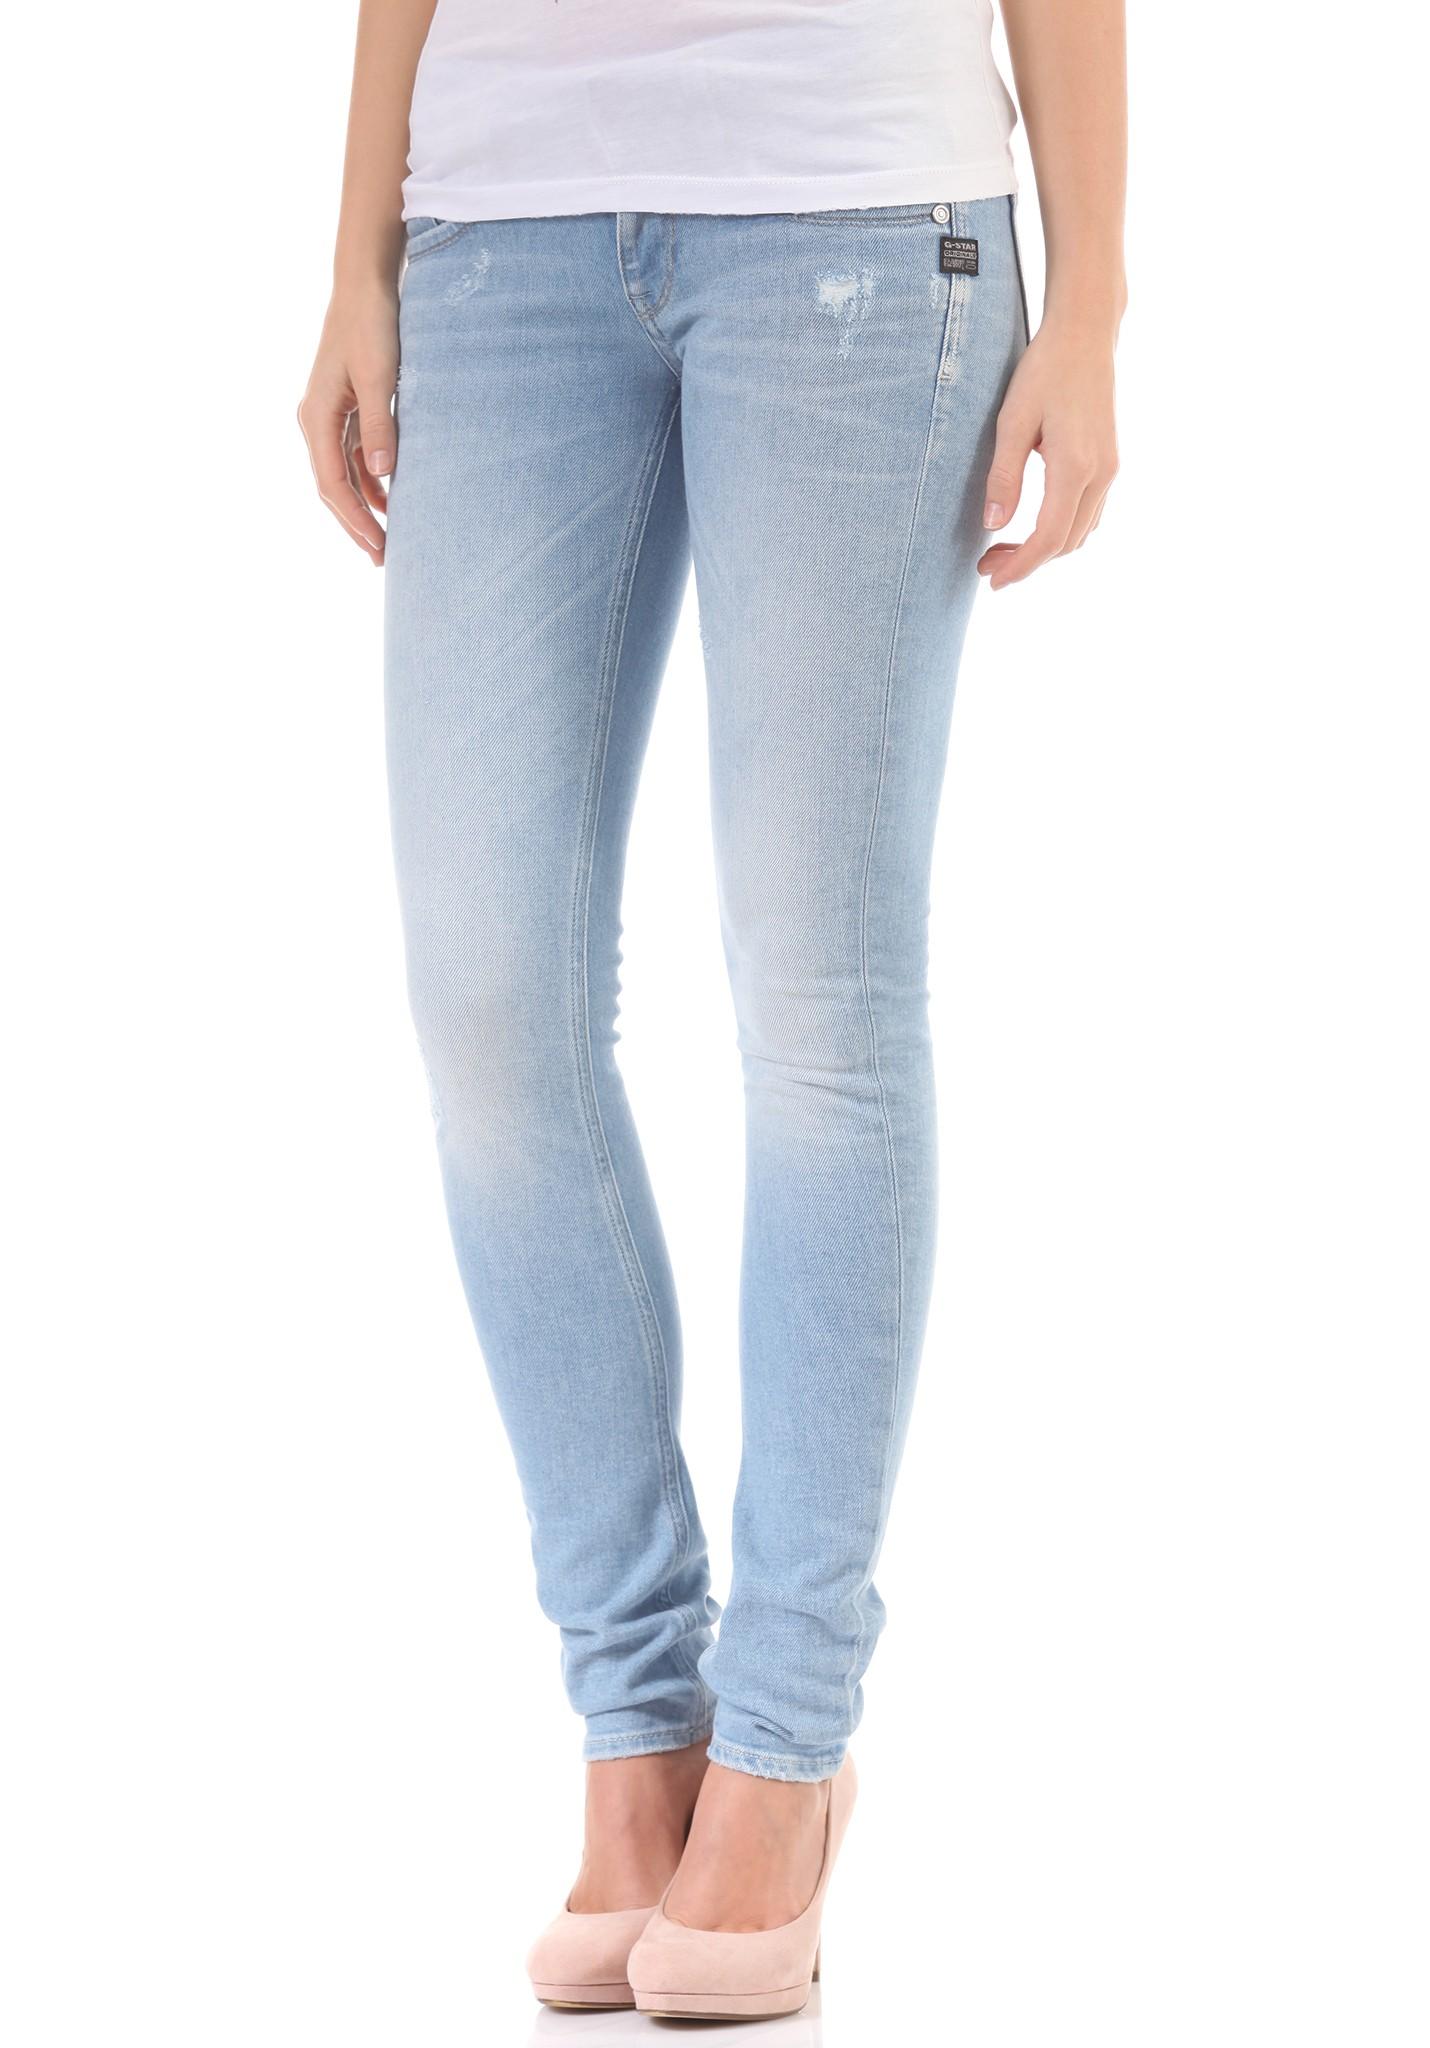 neu g star lynn skinny damen jeans hose ebay. Black Bedroom Furniture Sets. Home Design Ideas